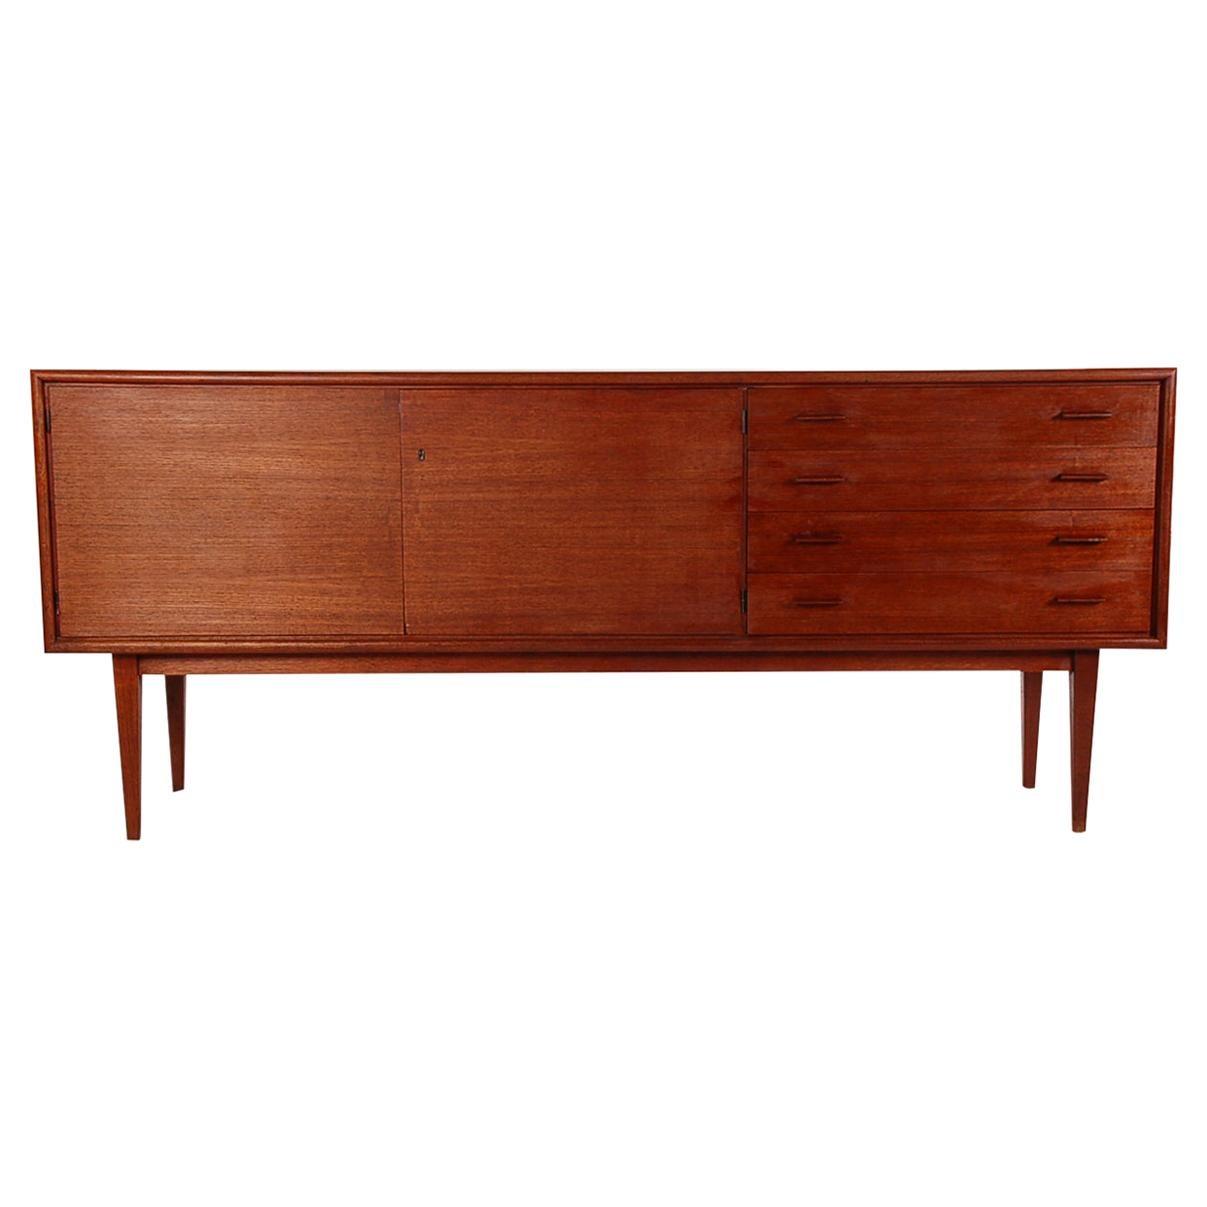 Midcentury Danish Modern Teak Credenza or Cabinet